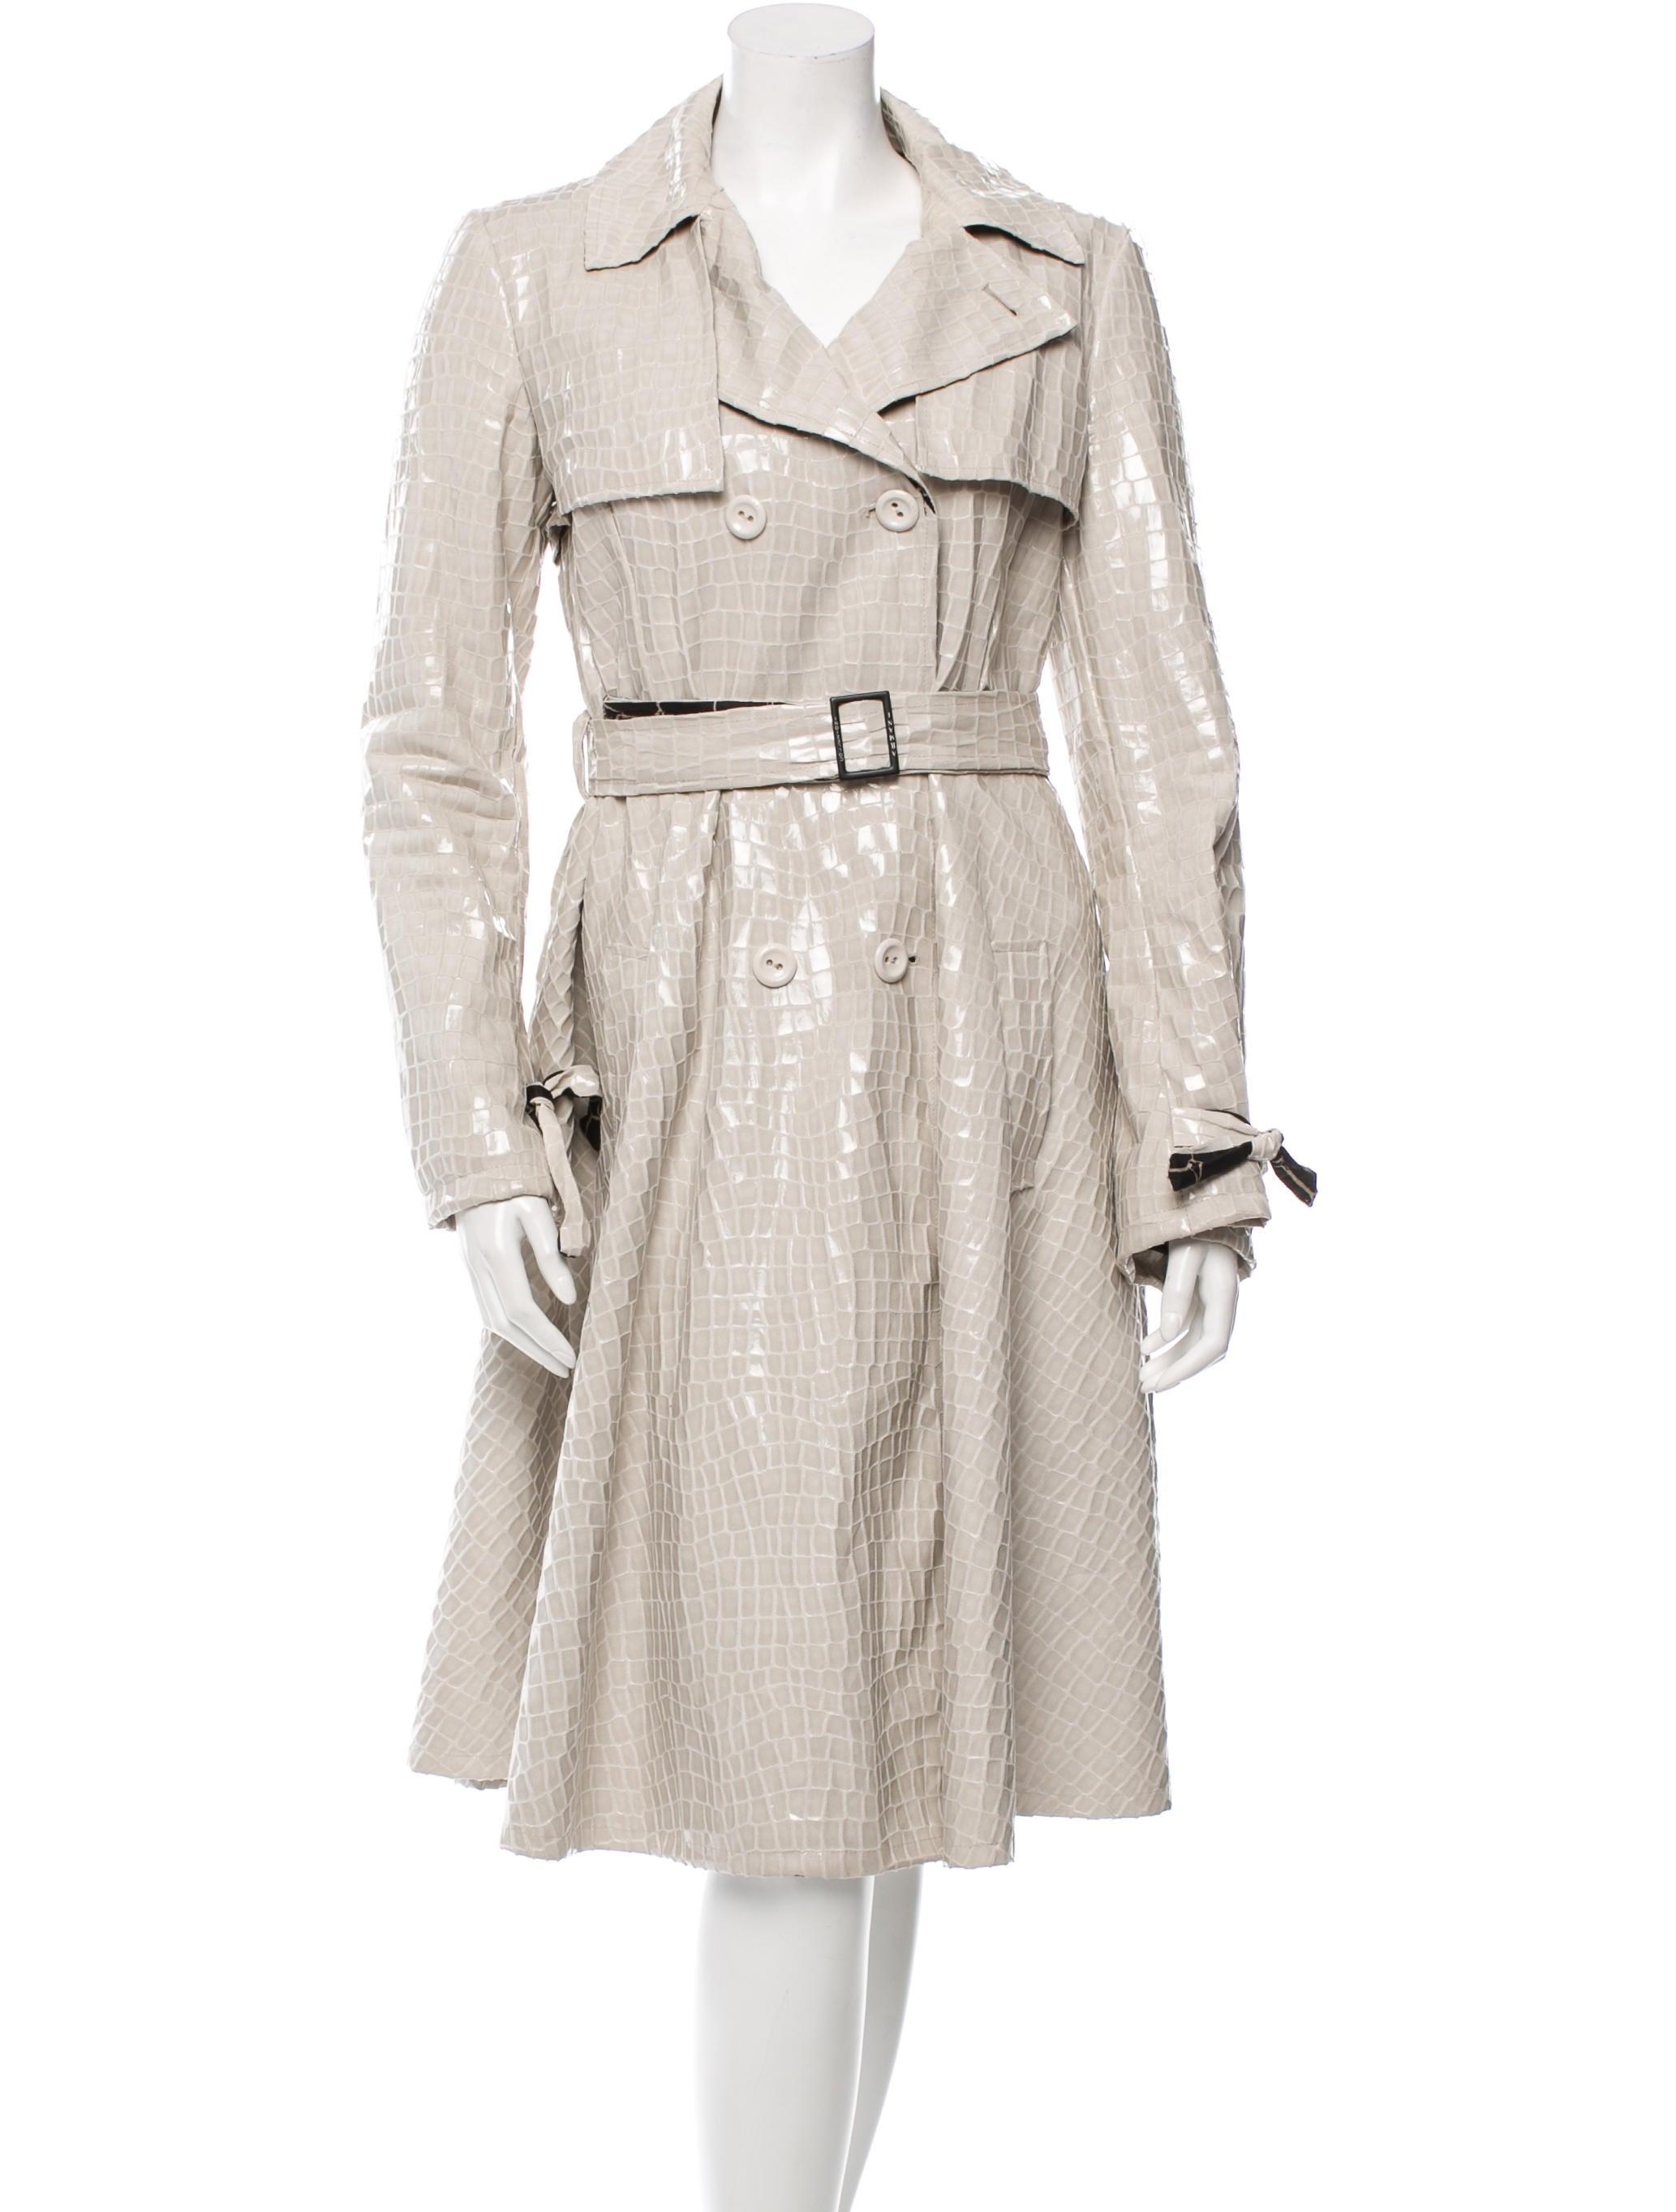 Betsey Johnson faux fur vegan coat brown black women's size medium. Pre-Owned. Obey Propaganda Size Small S Moto Jacket Womens Vegan Leather Denim Jean Coat. OBEY · Size (Women's):S · Denim.